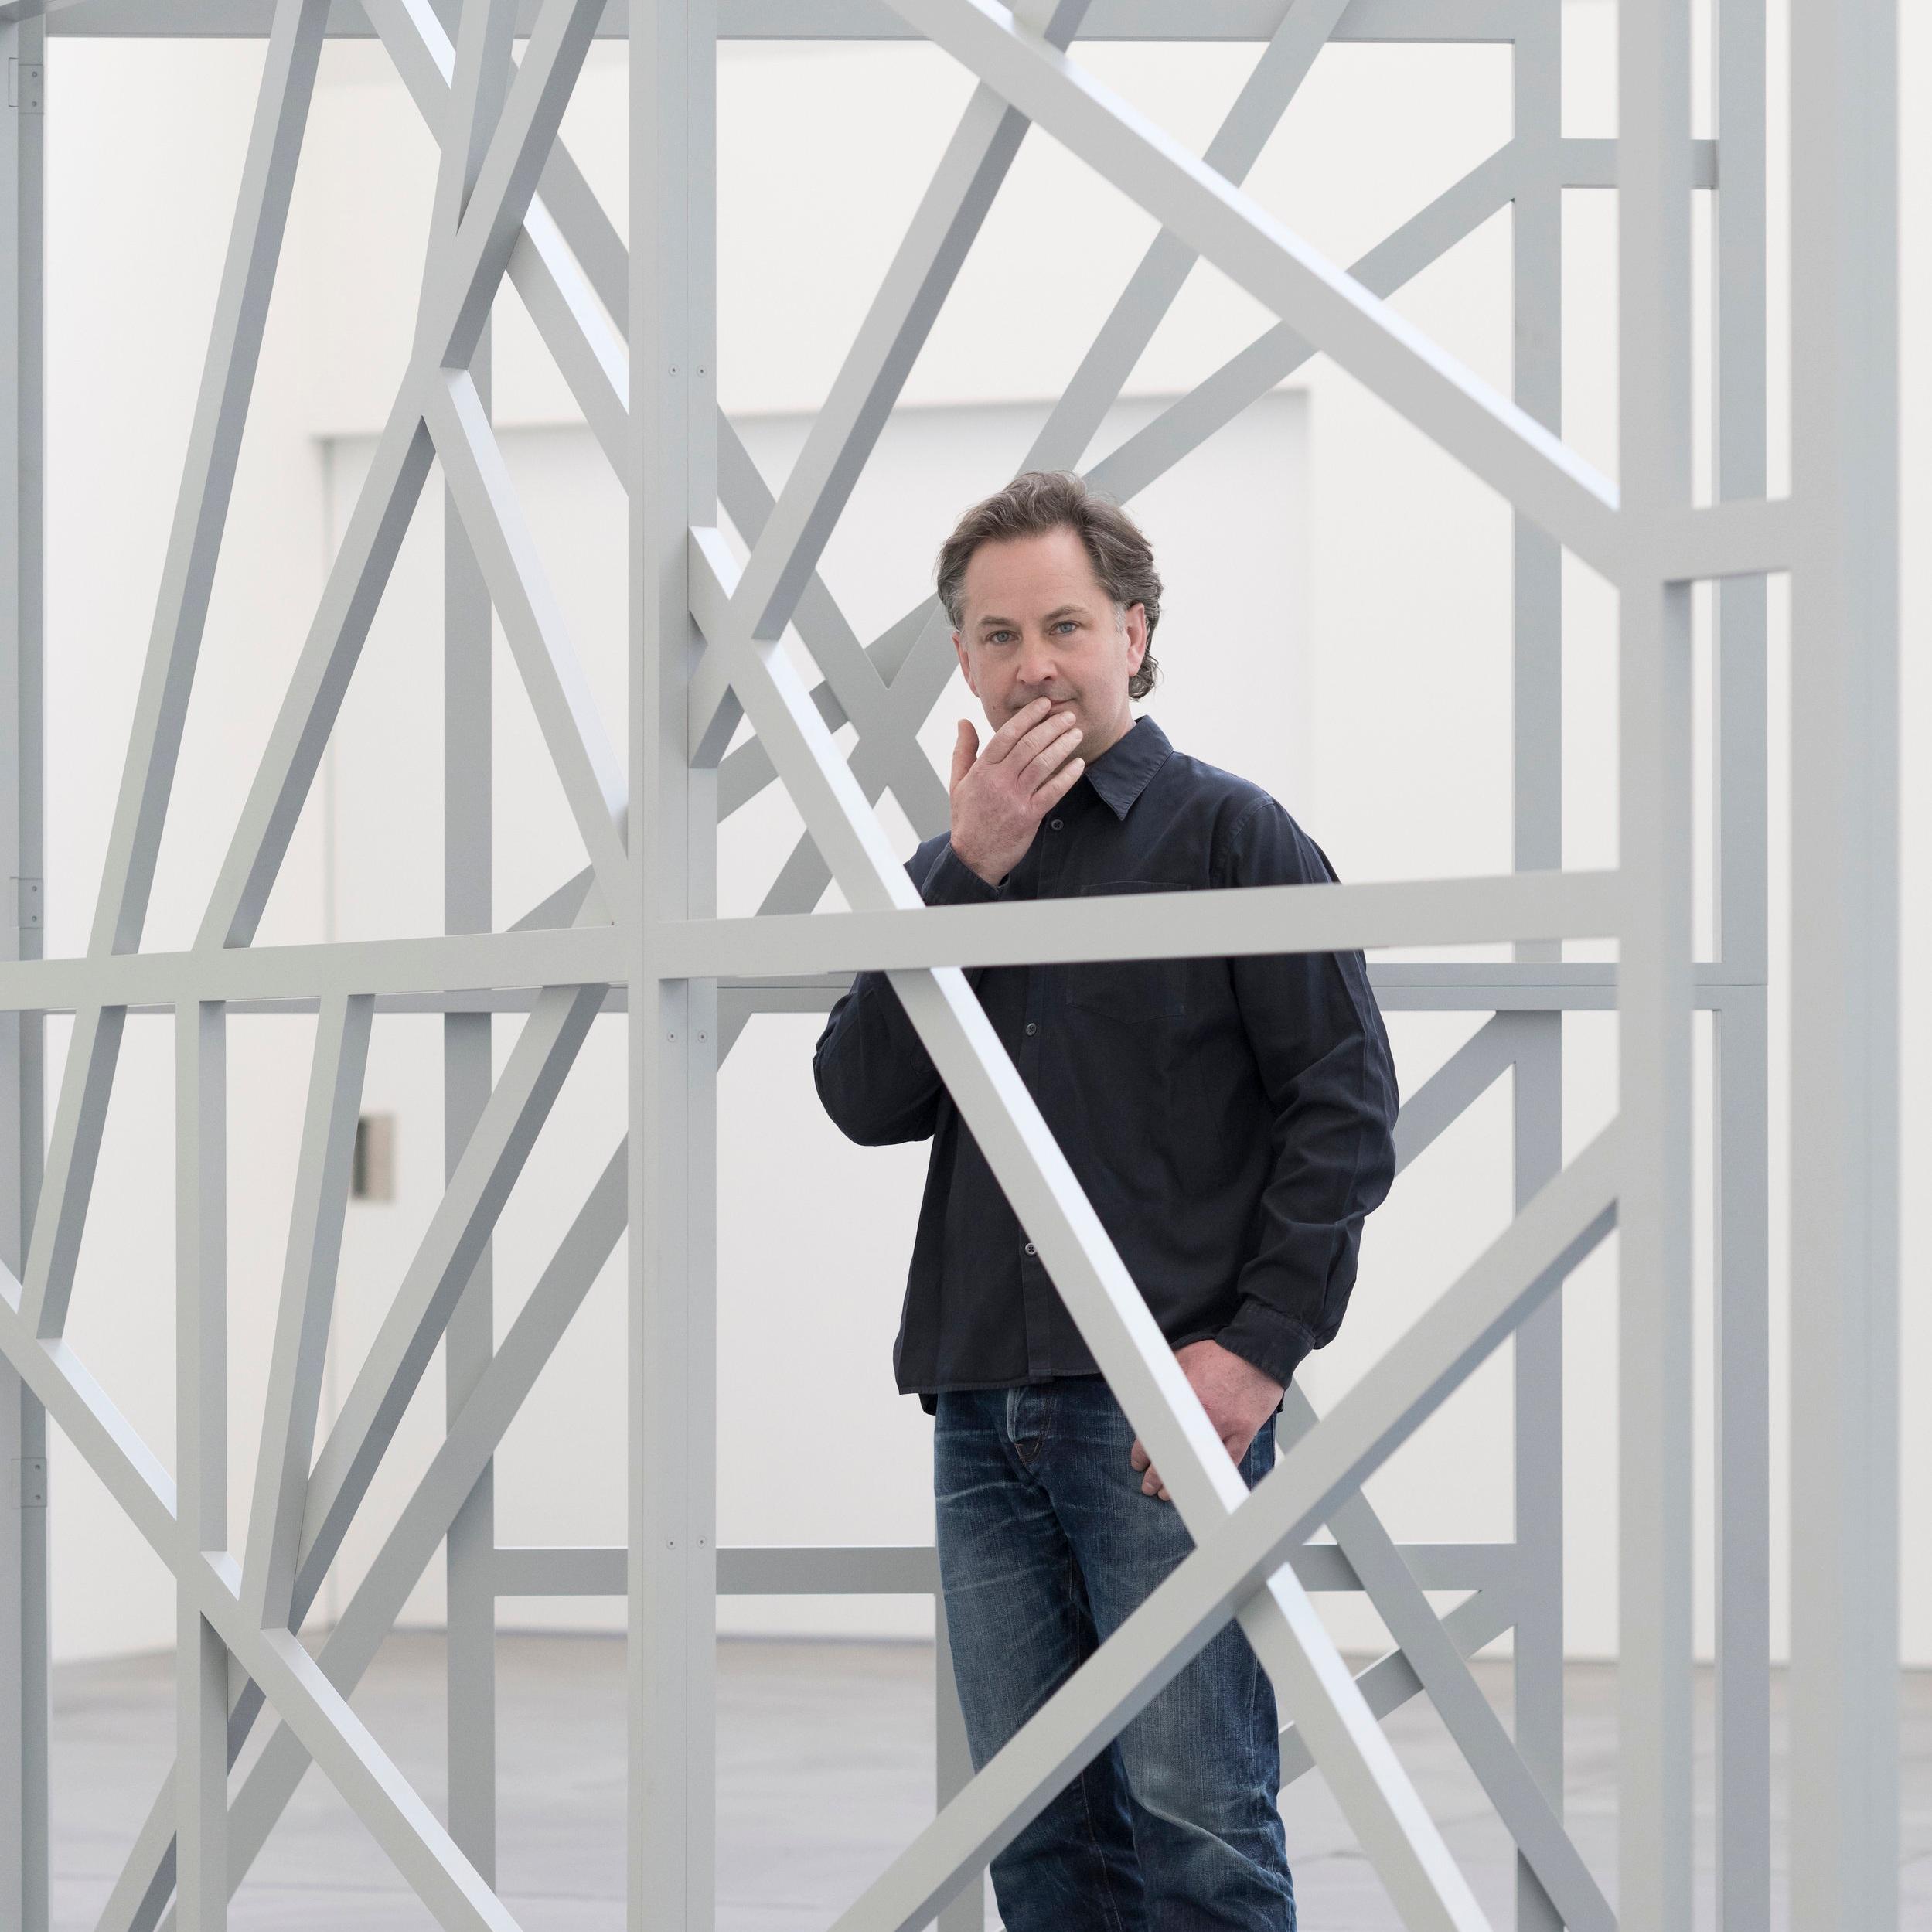 Andrew_Bick_Andreas+Zimmermann-Basel+2018.jpg